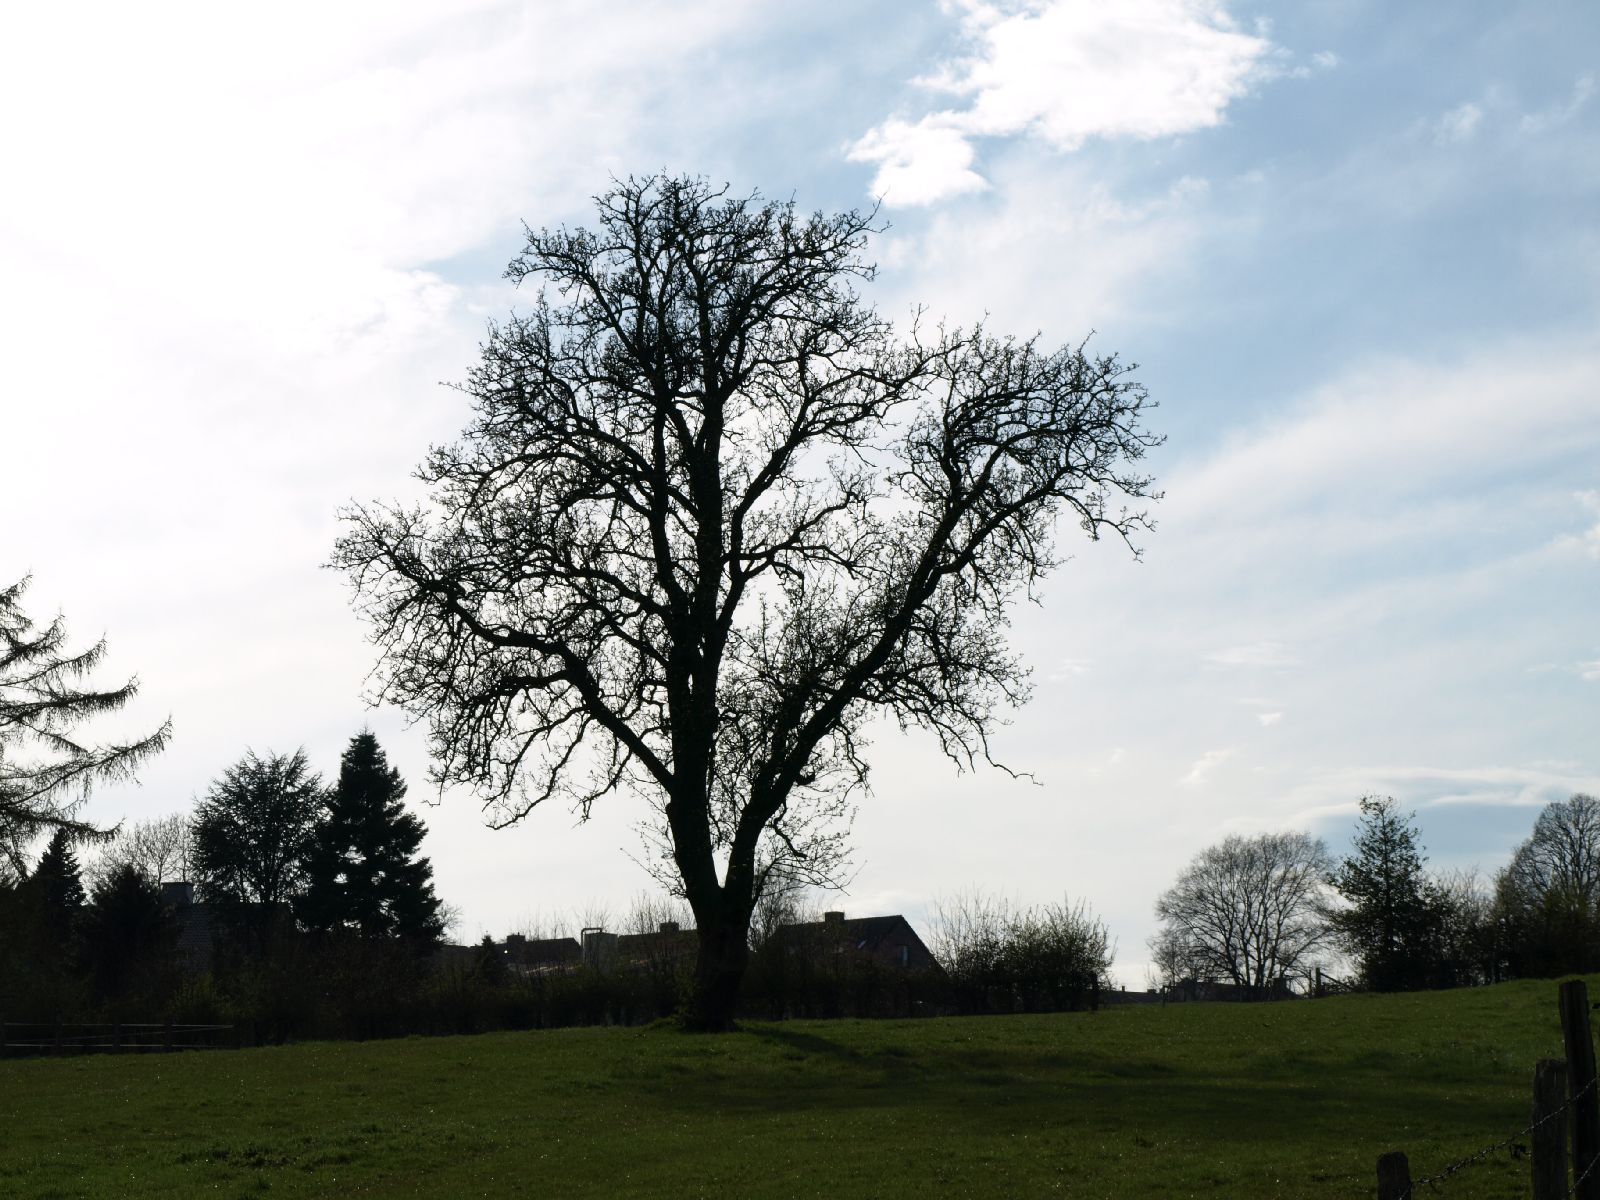 Pflanzen-Baum-Silhouette-Foto_Textur_B_P4201544